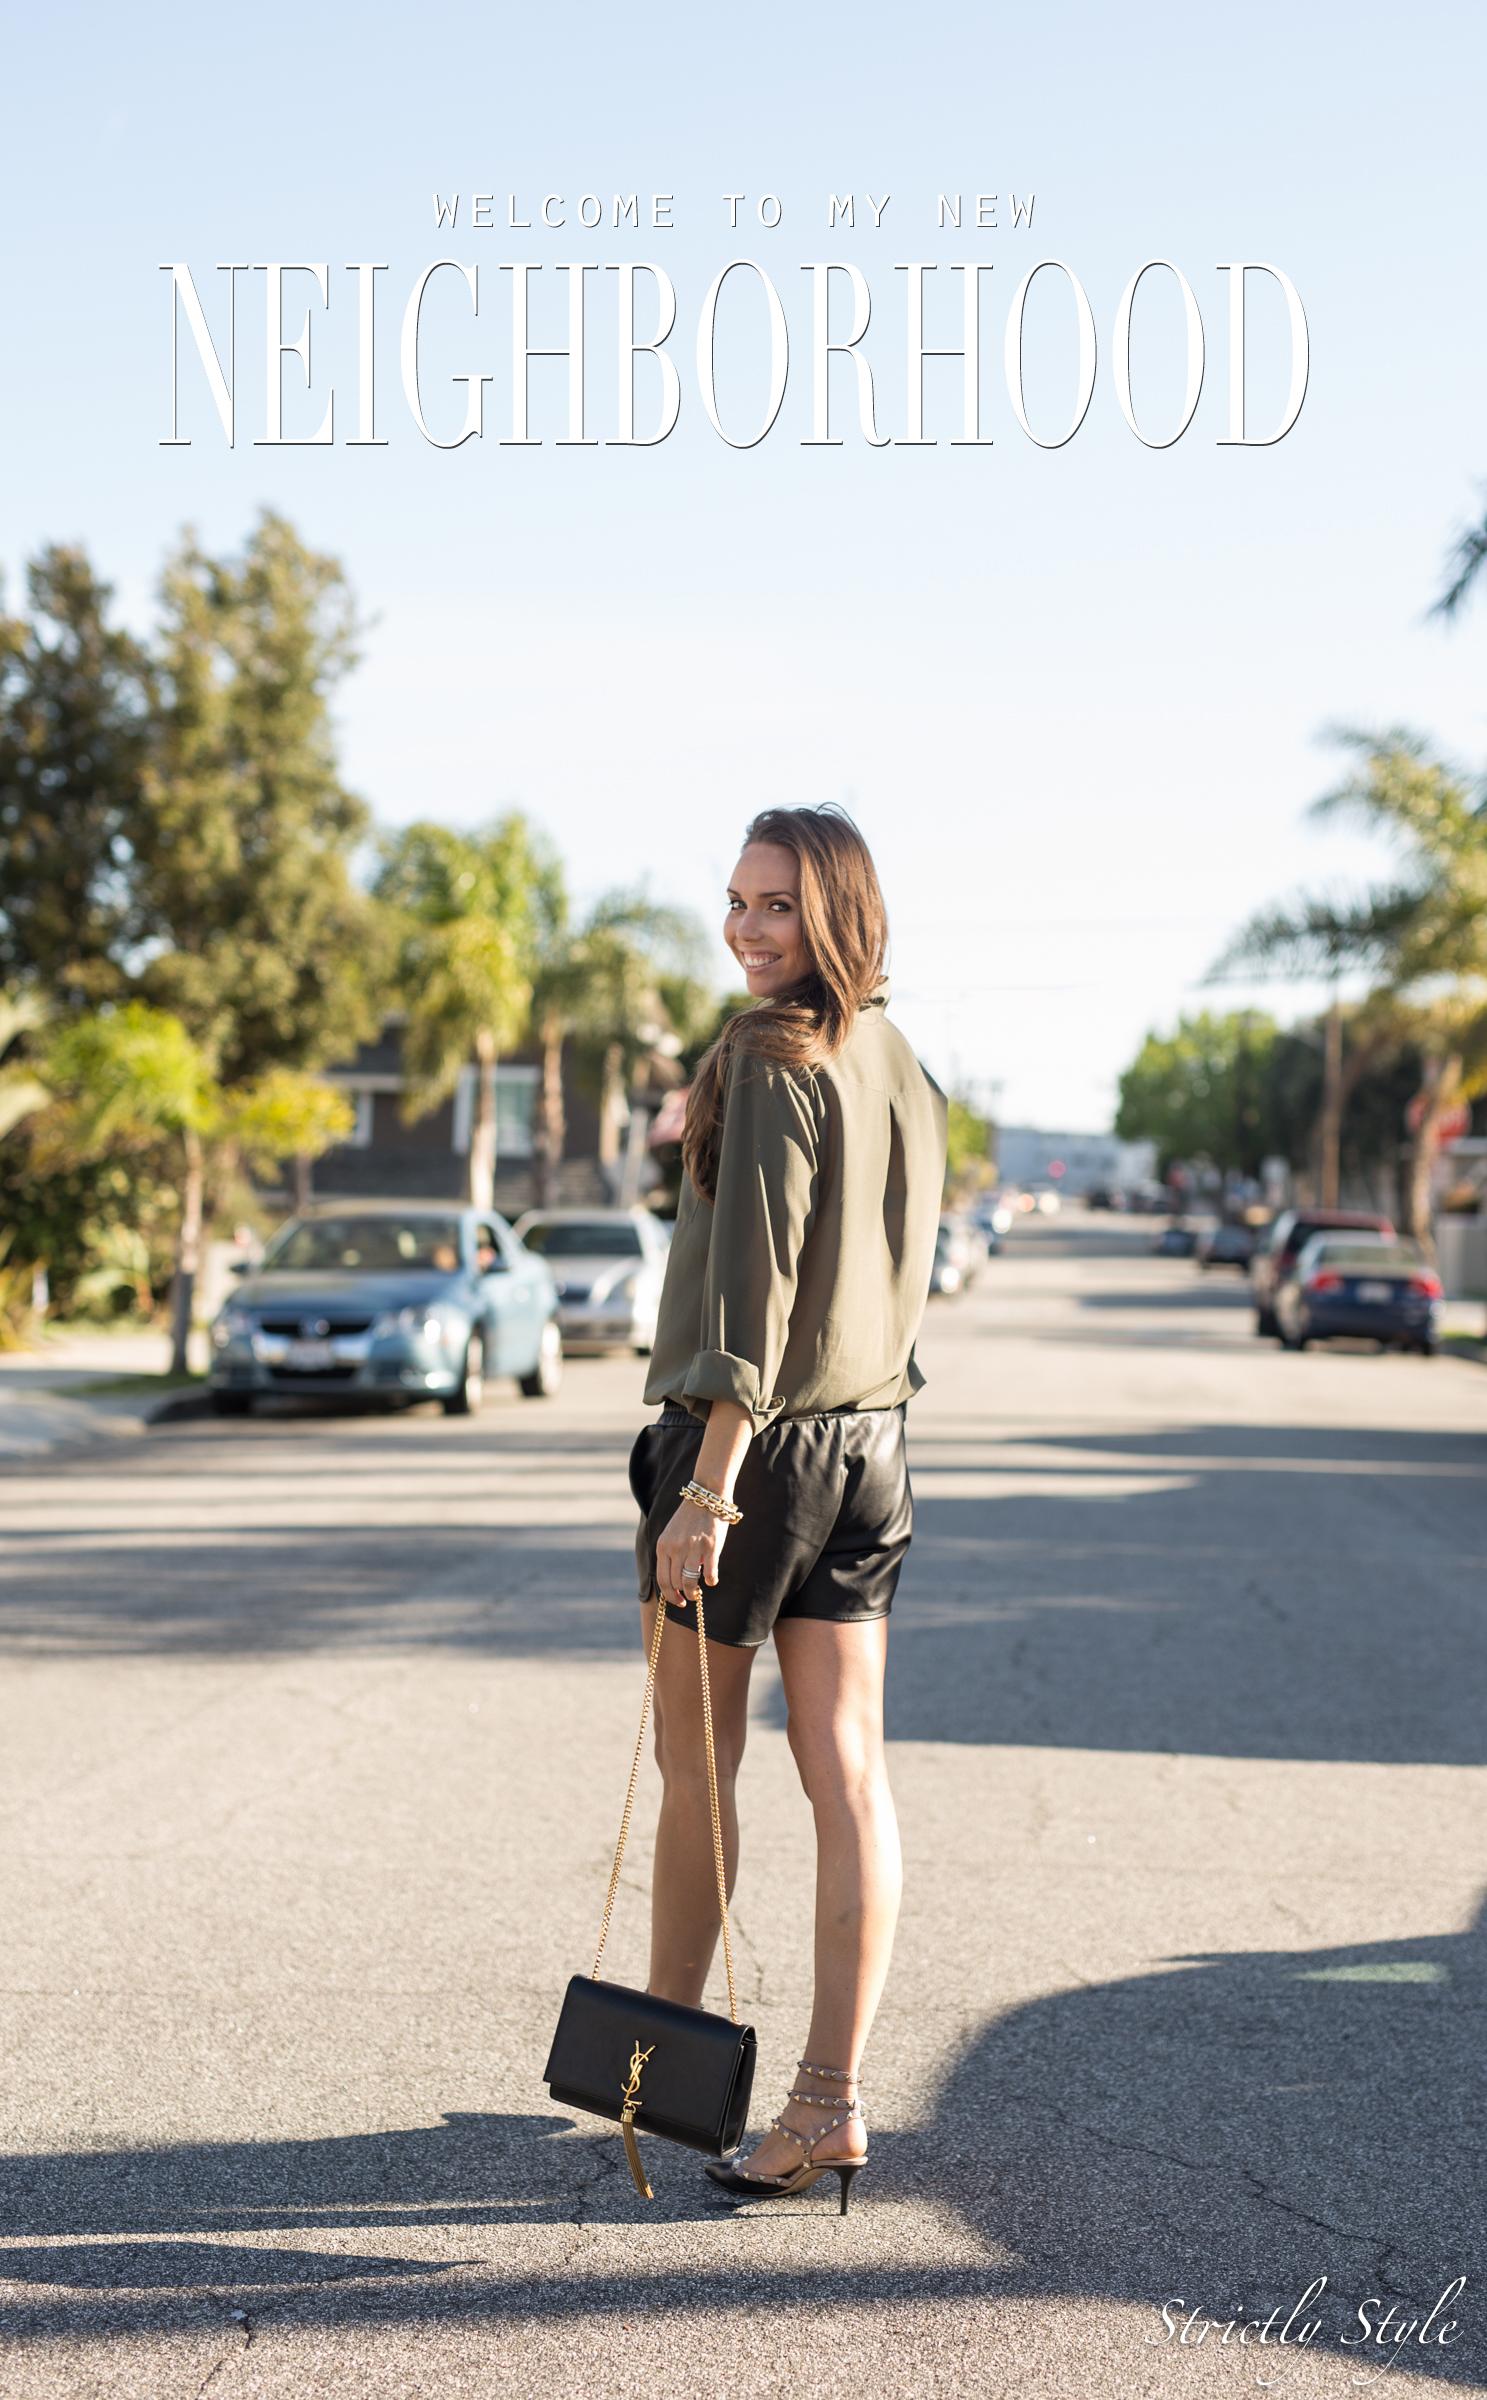 eka asu losissa valnrtino rockstuds black leather shorts-9889TEXT